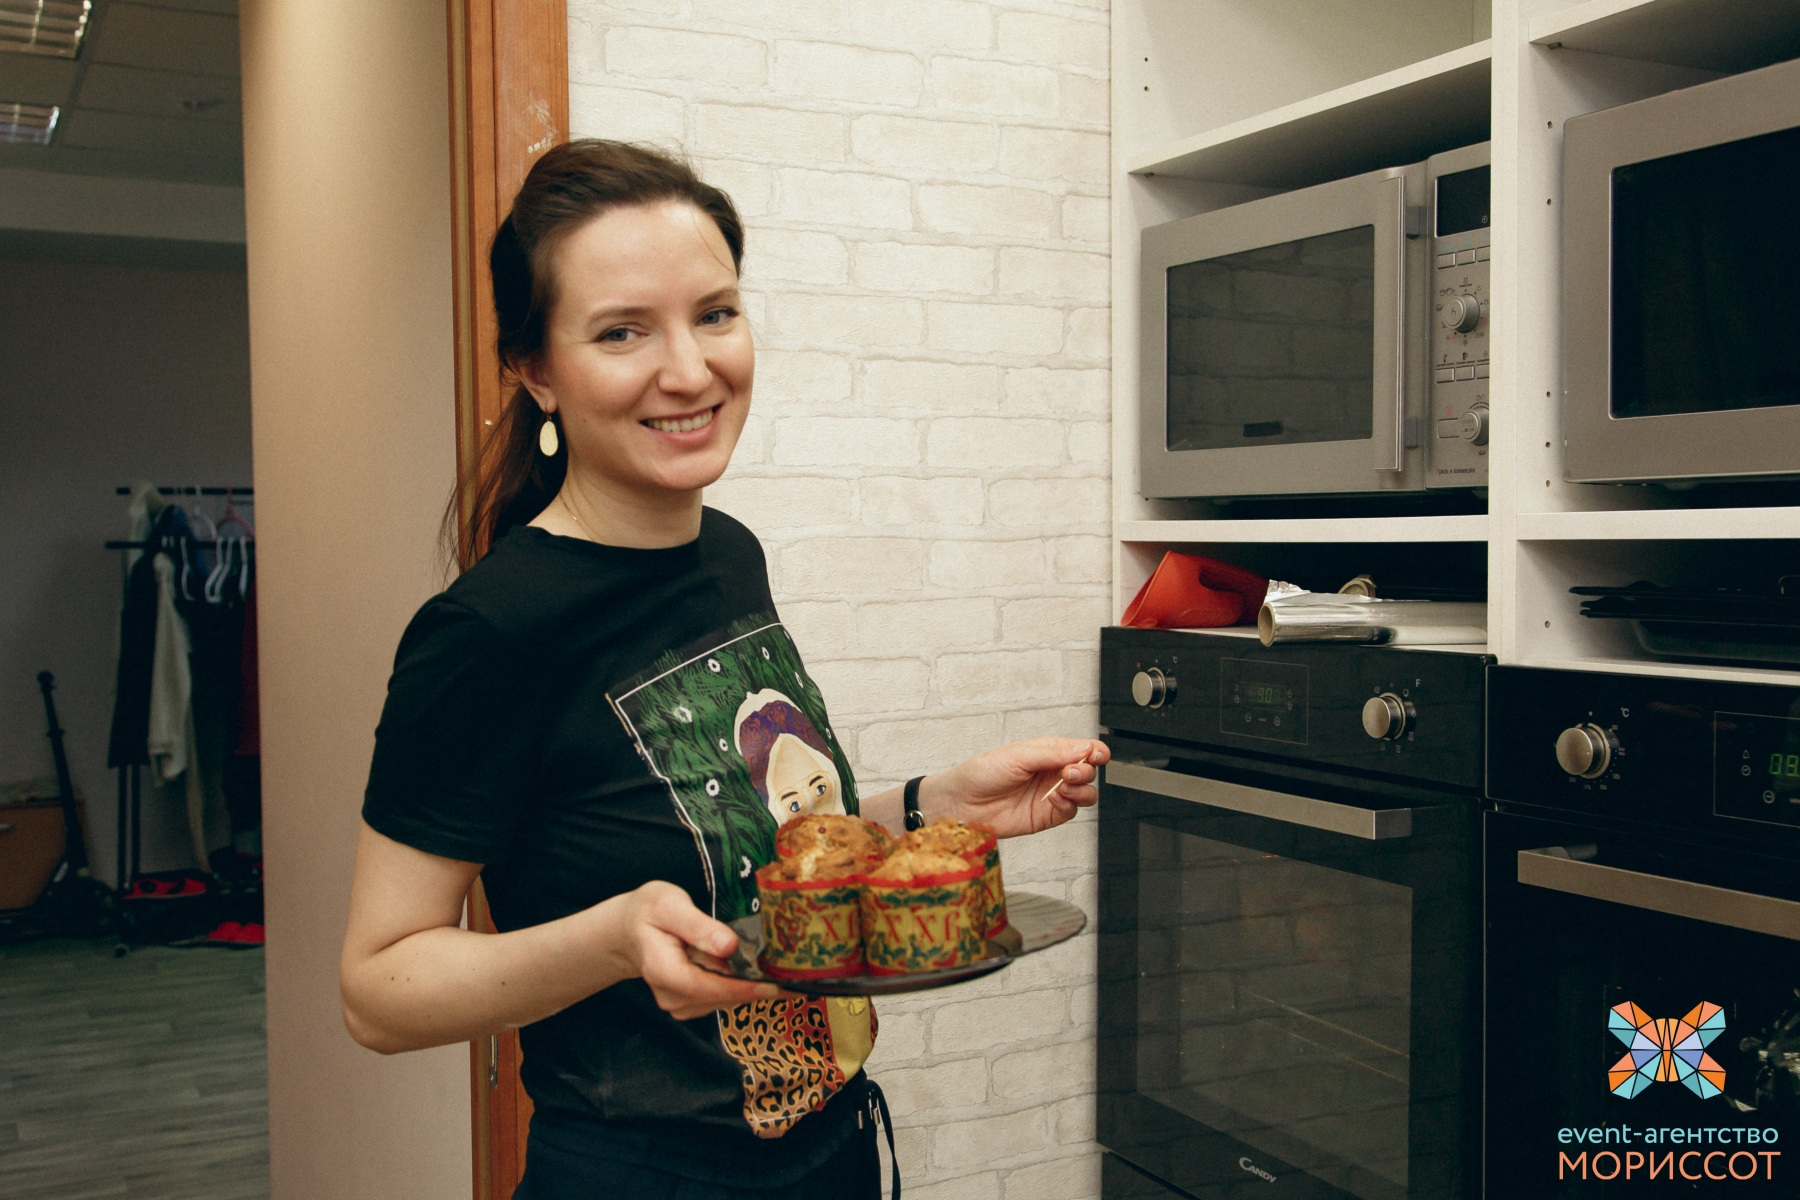 FOTOZ.ru Studio